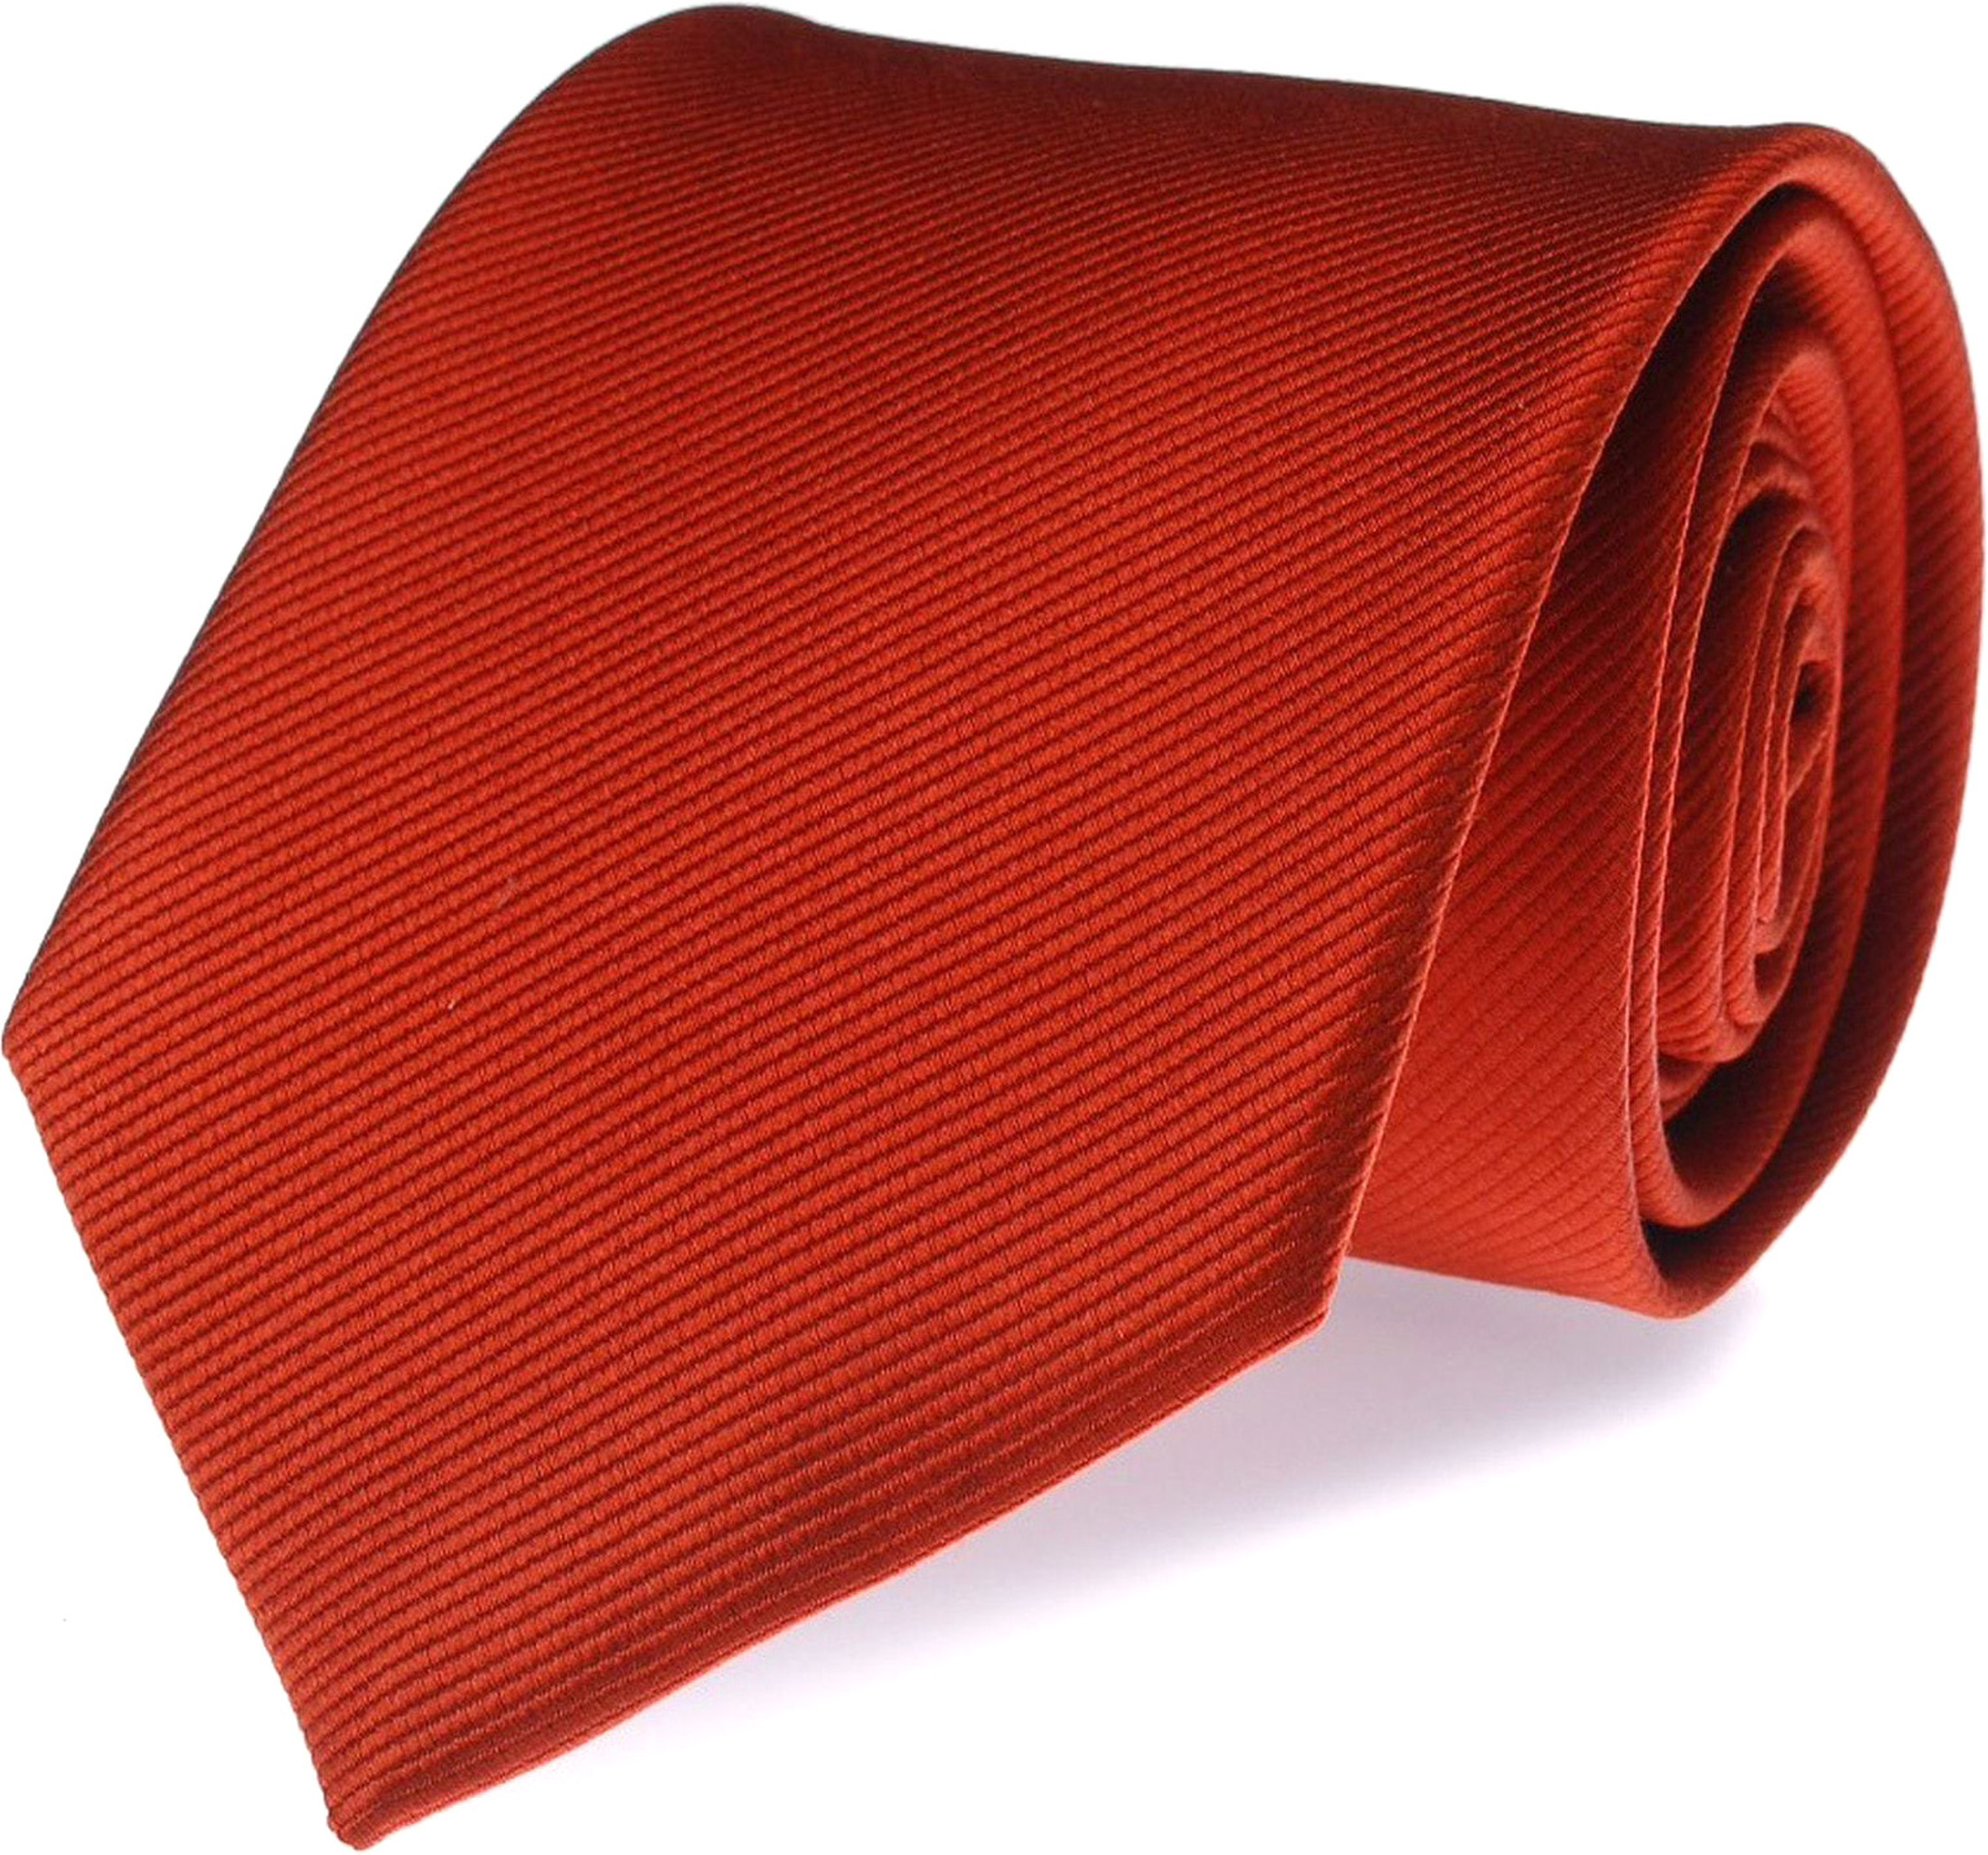 Silk Tie Red F34 foto 0